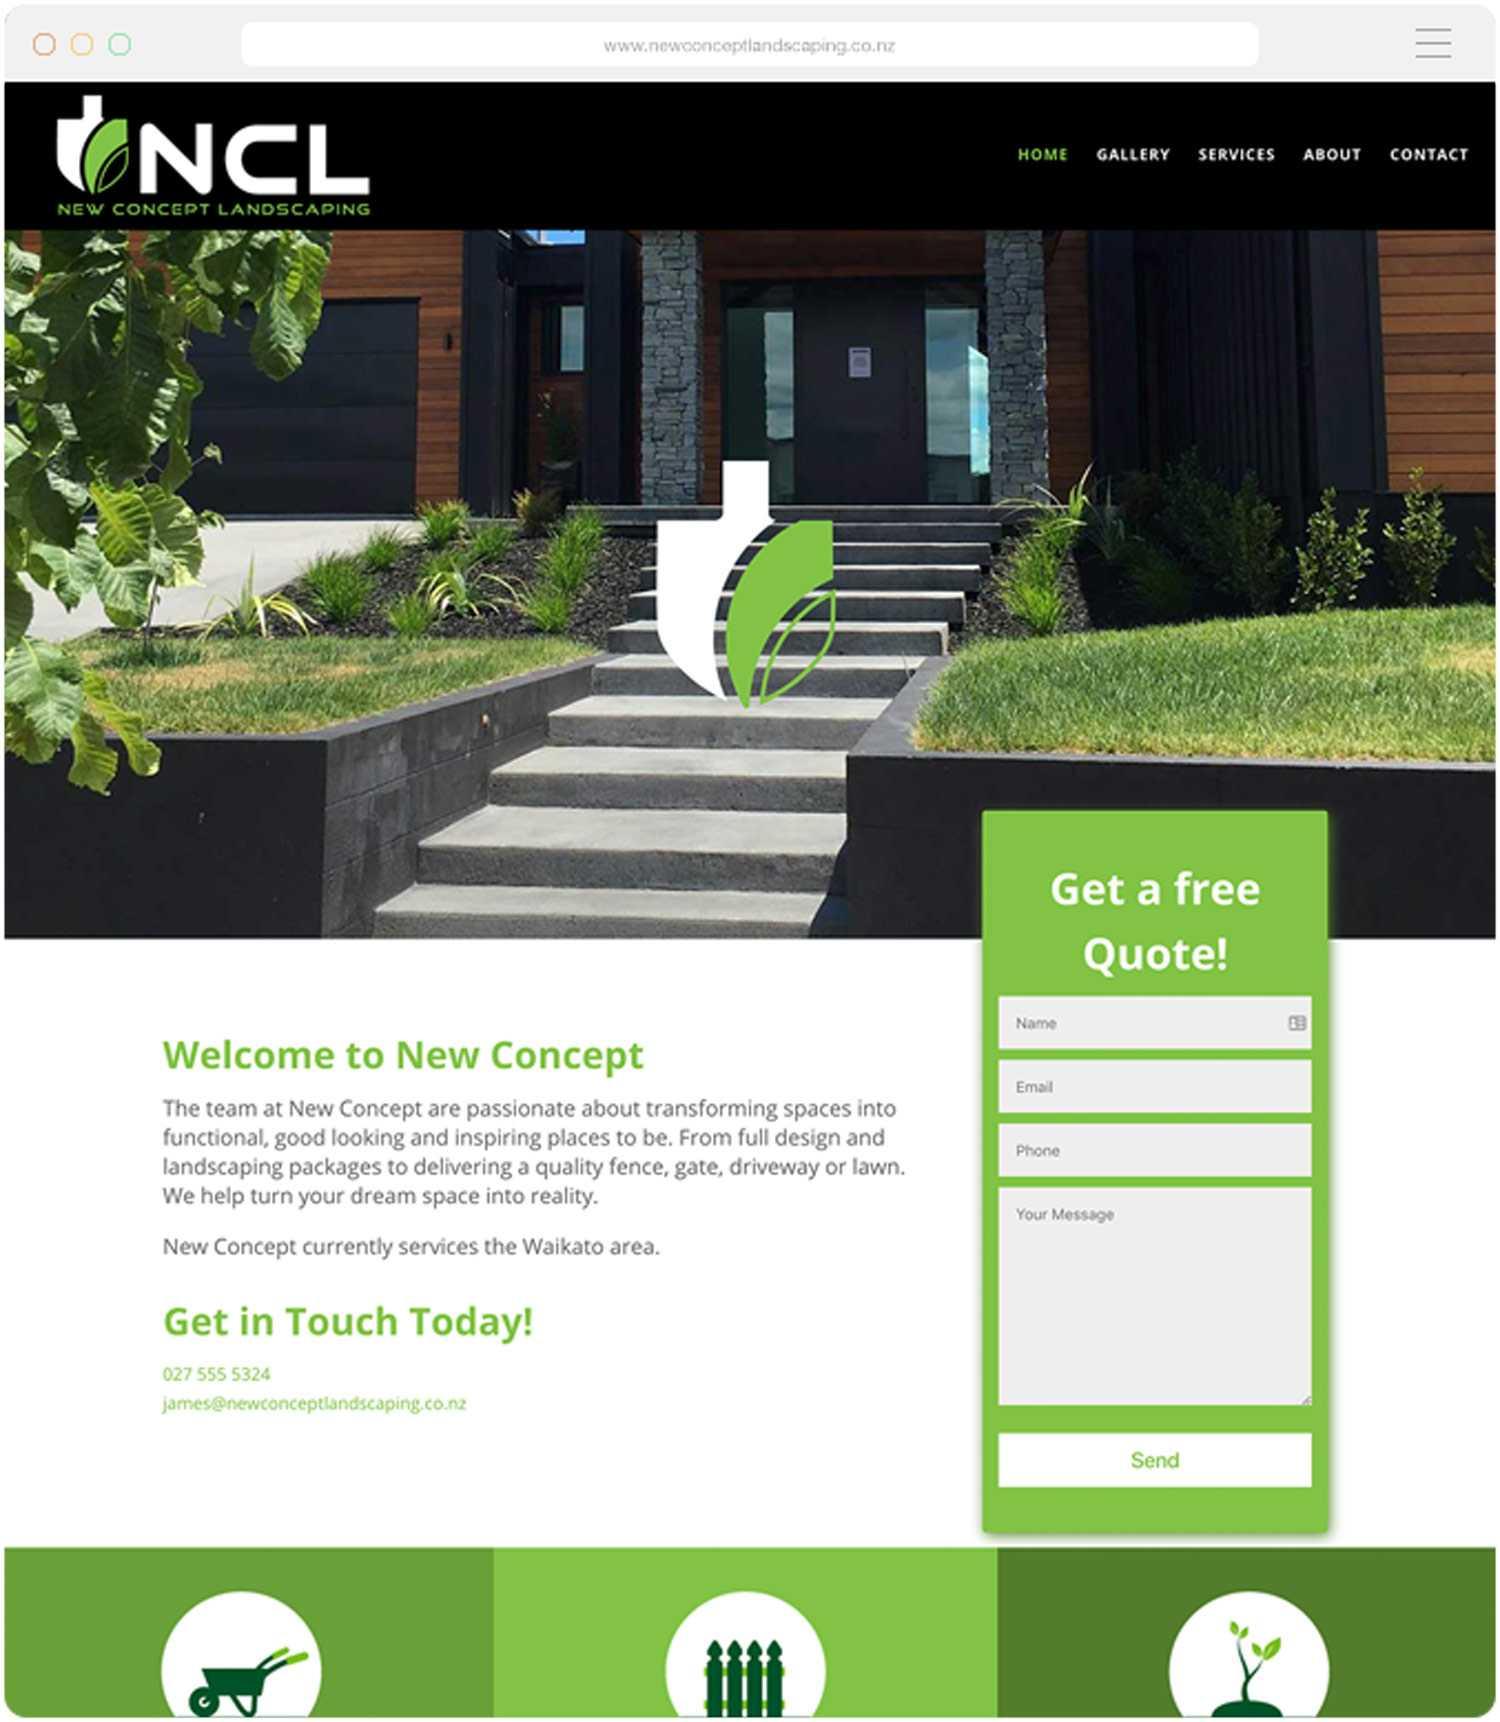 Landscaping Websitee Build for NCL